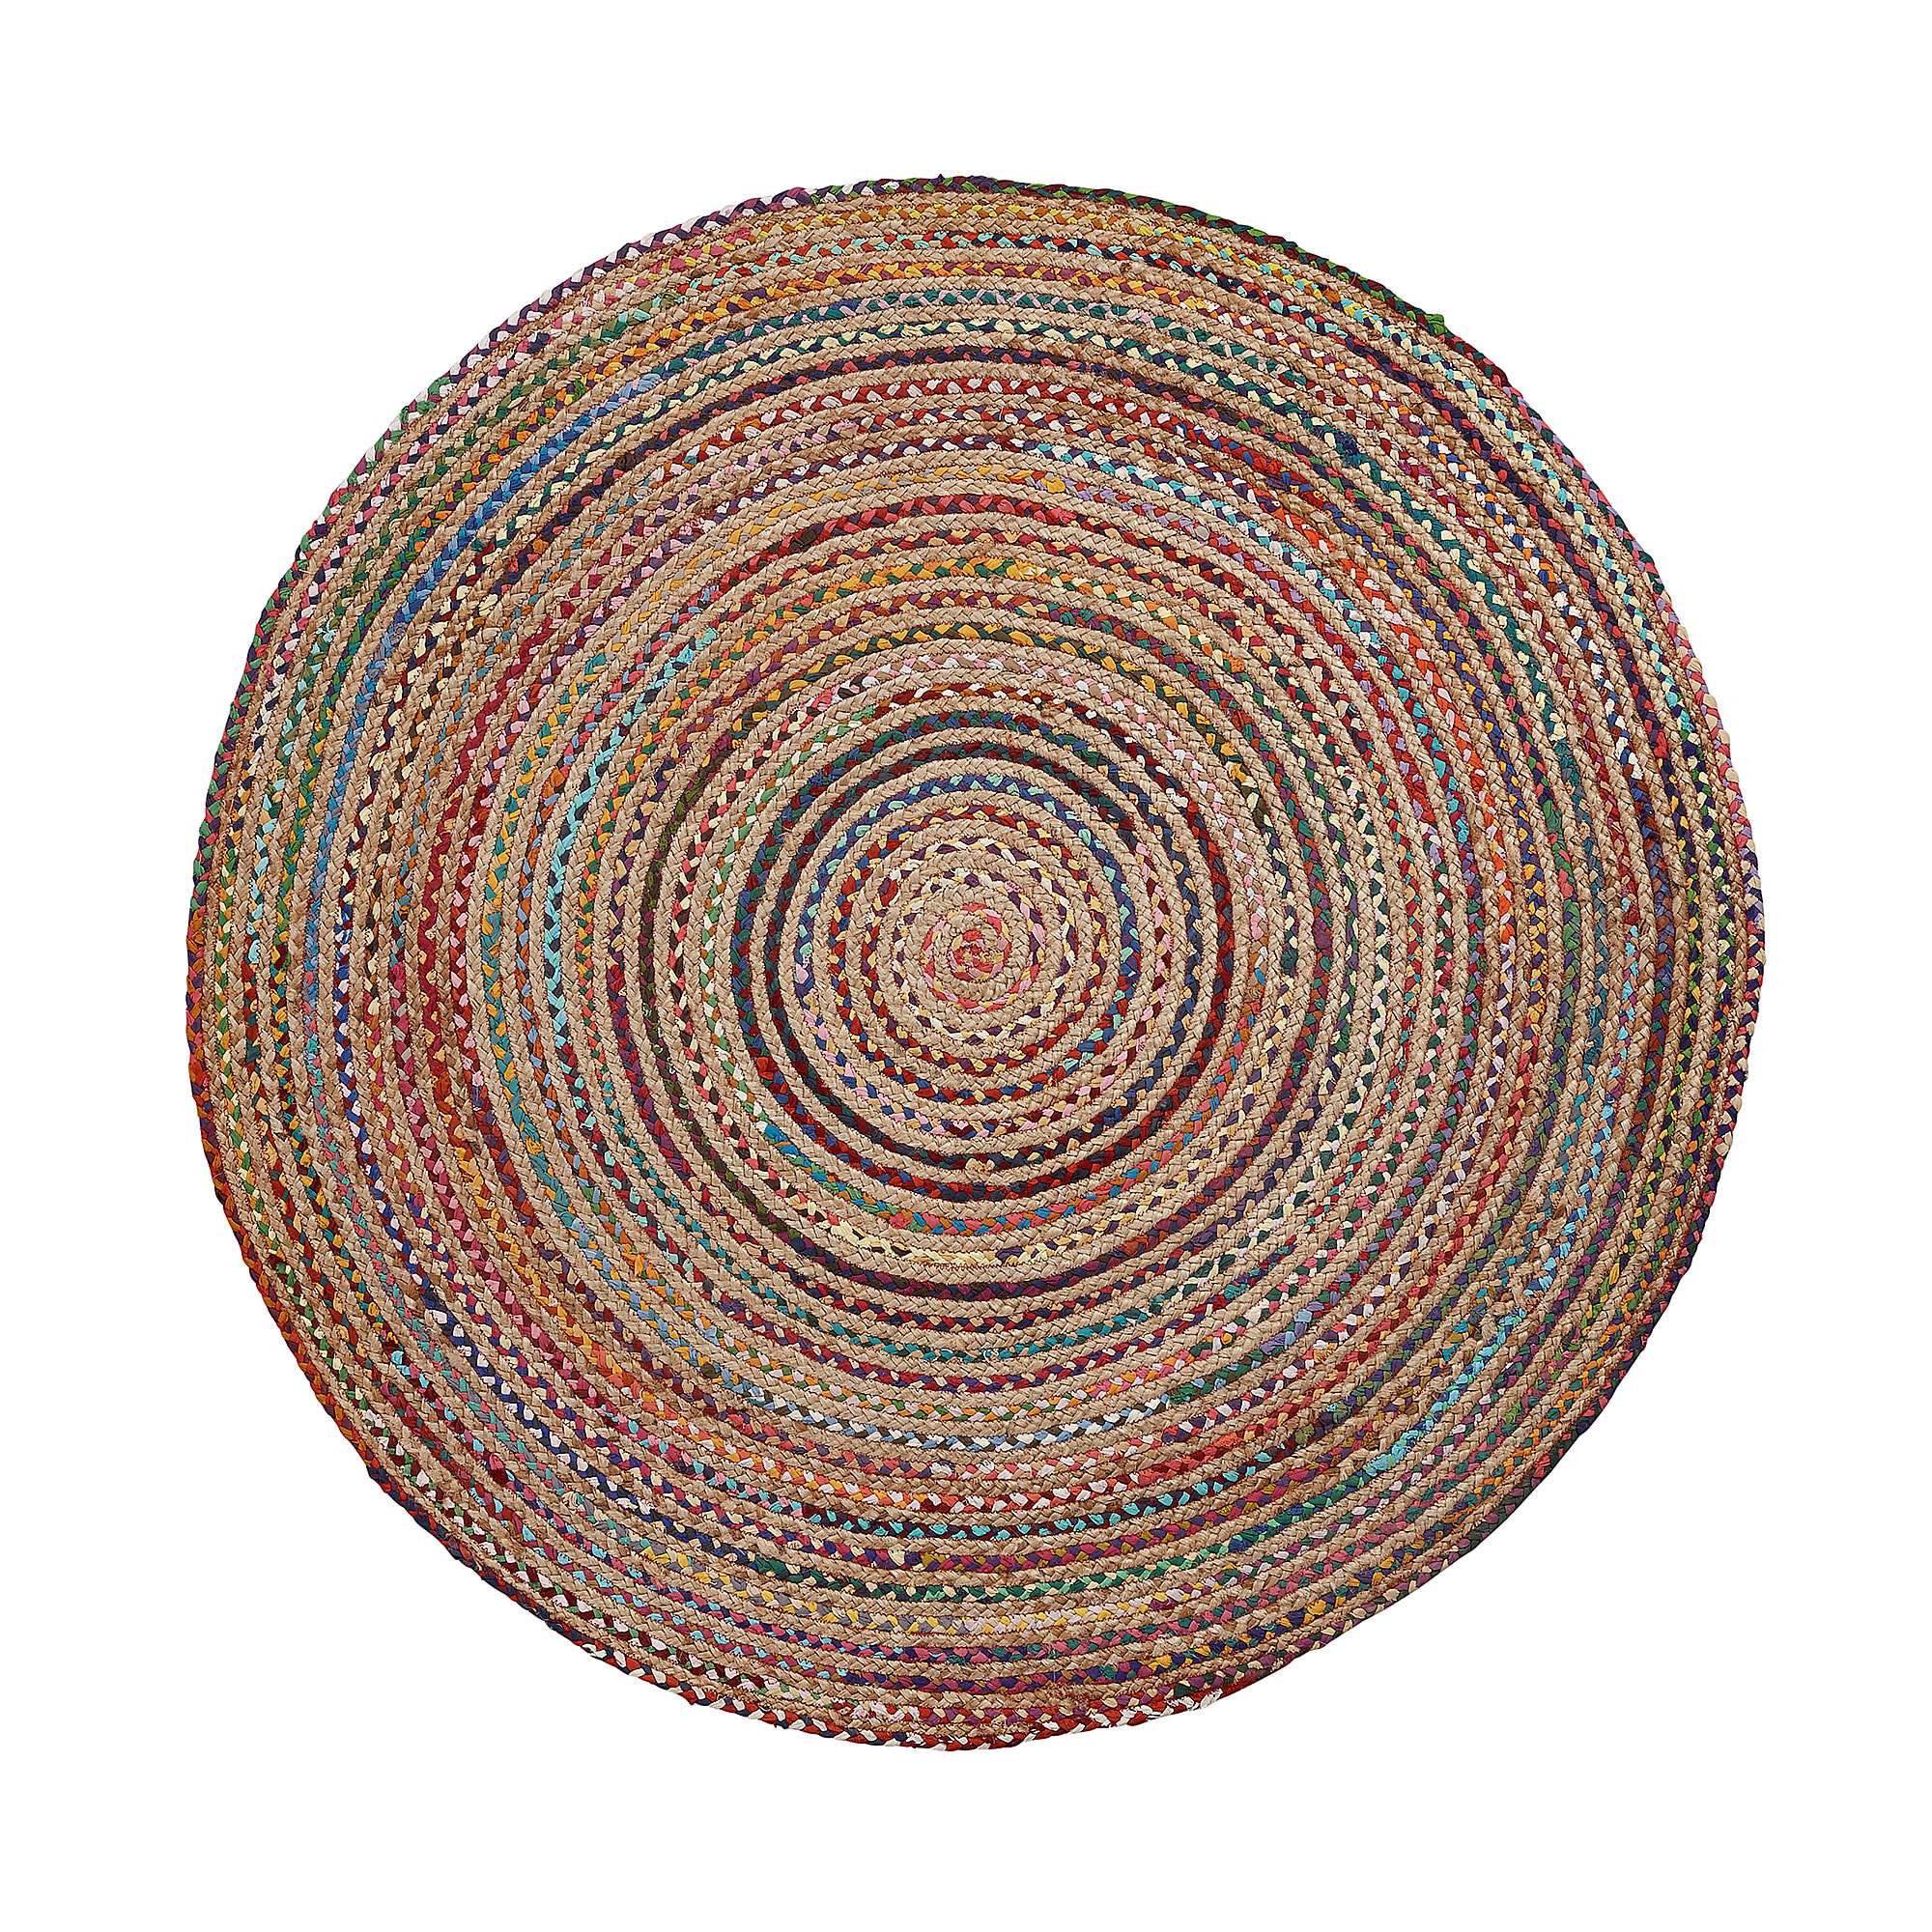 Kave Home Rond Vloerkleed 'Saht' 100cm, multicolor Woonaccessoires | Vloerkleden